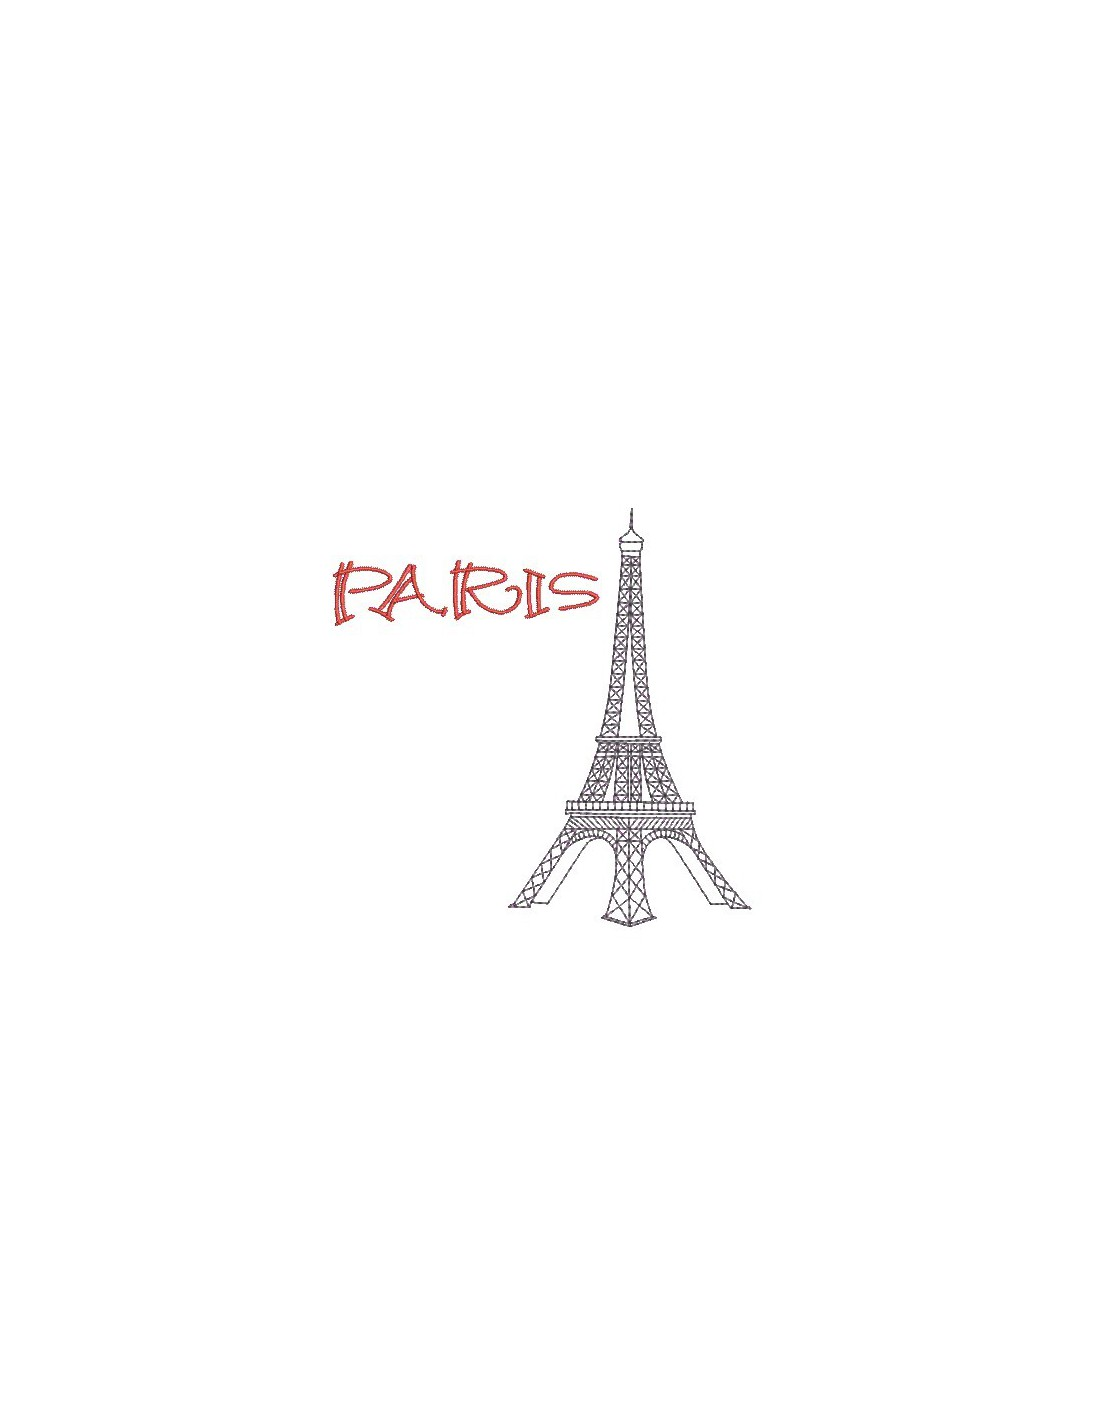 Embroidery Design Eiffel Tower Paris Alice Broderie